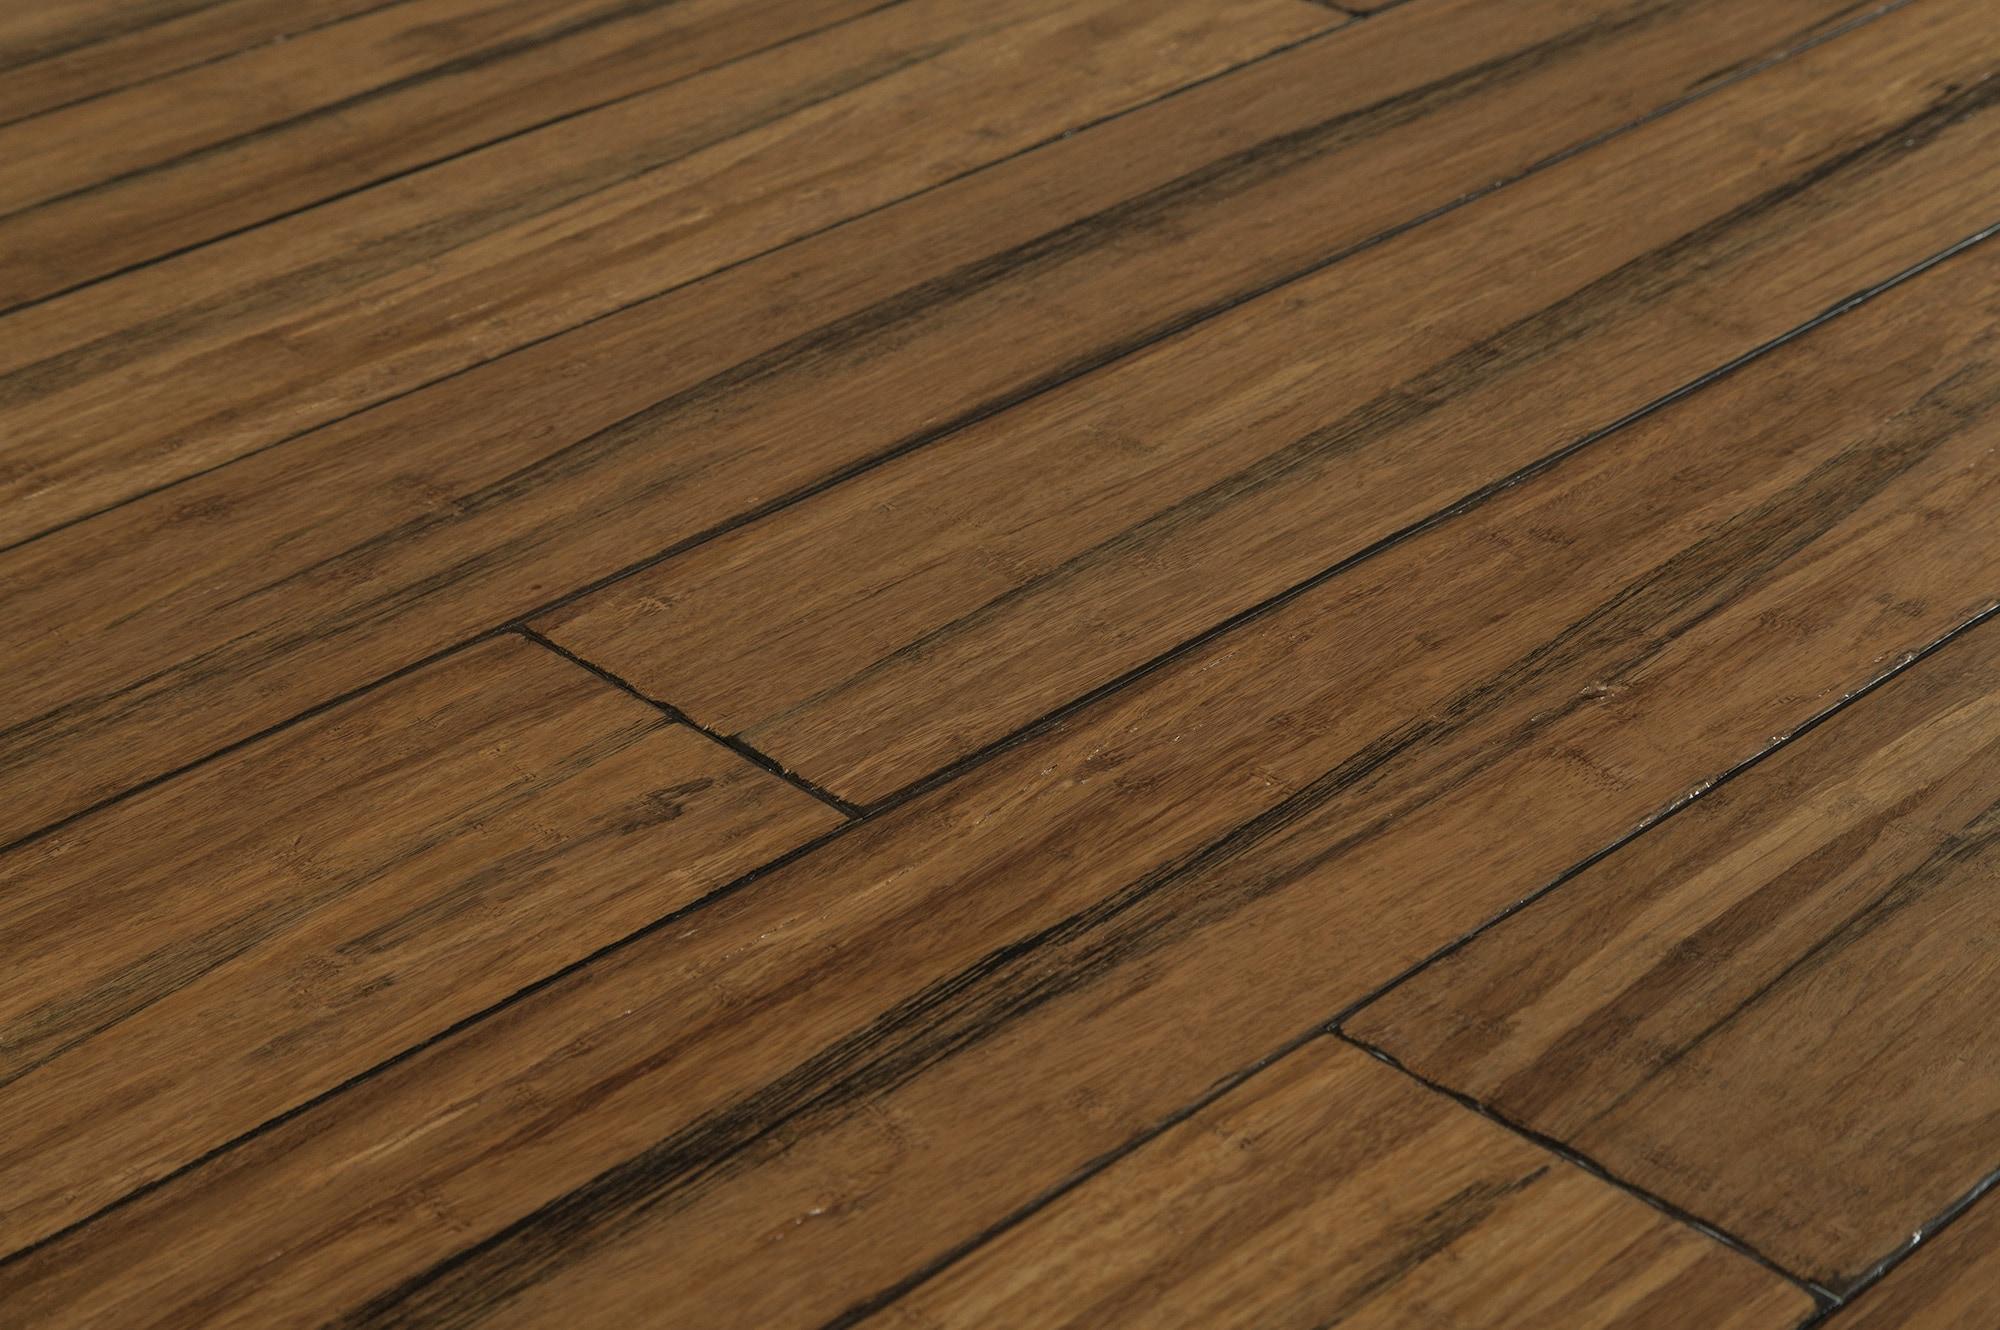 28 best scraped bamboo flooring reviews free sles Carbonized strand bamboo flooring reviews